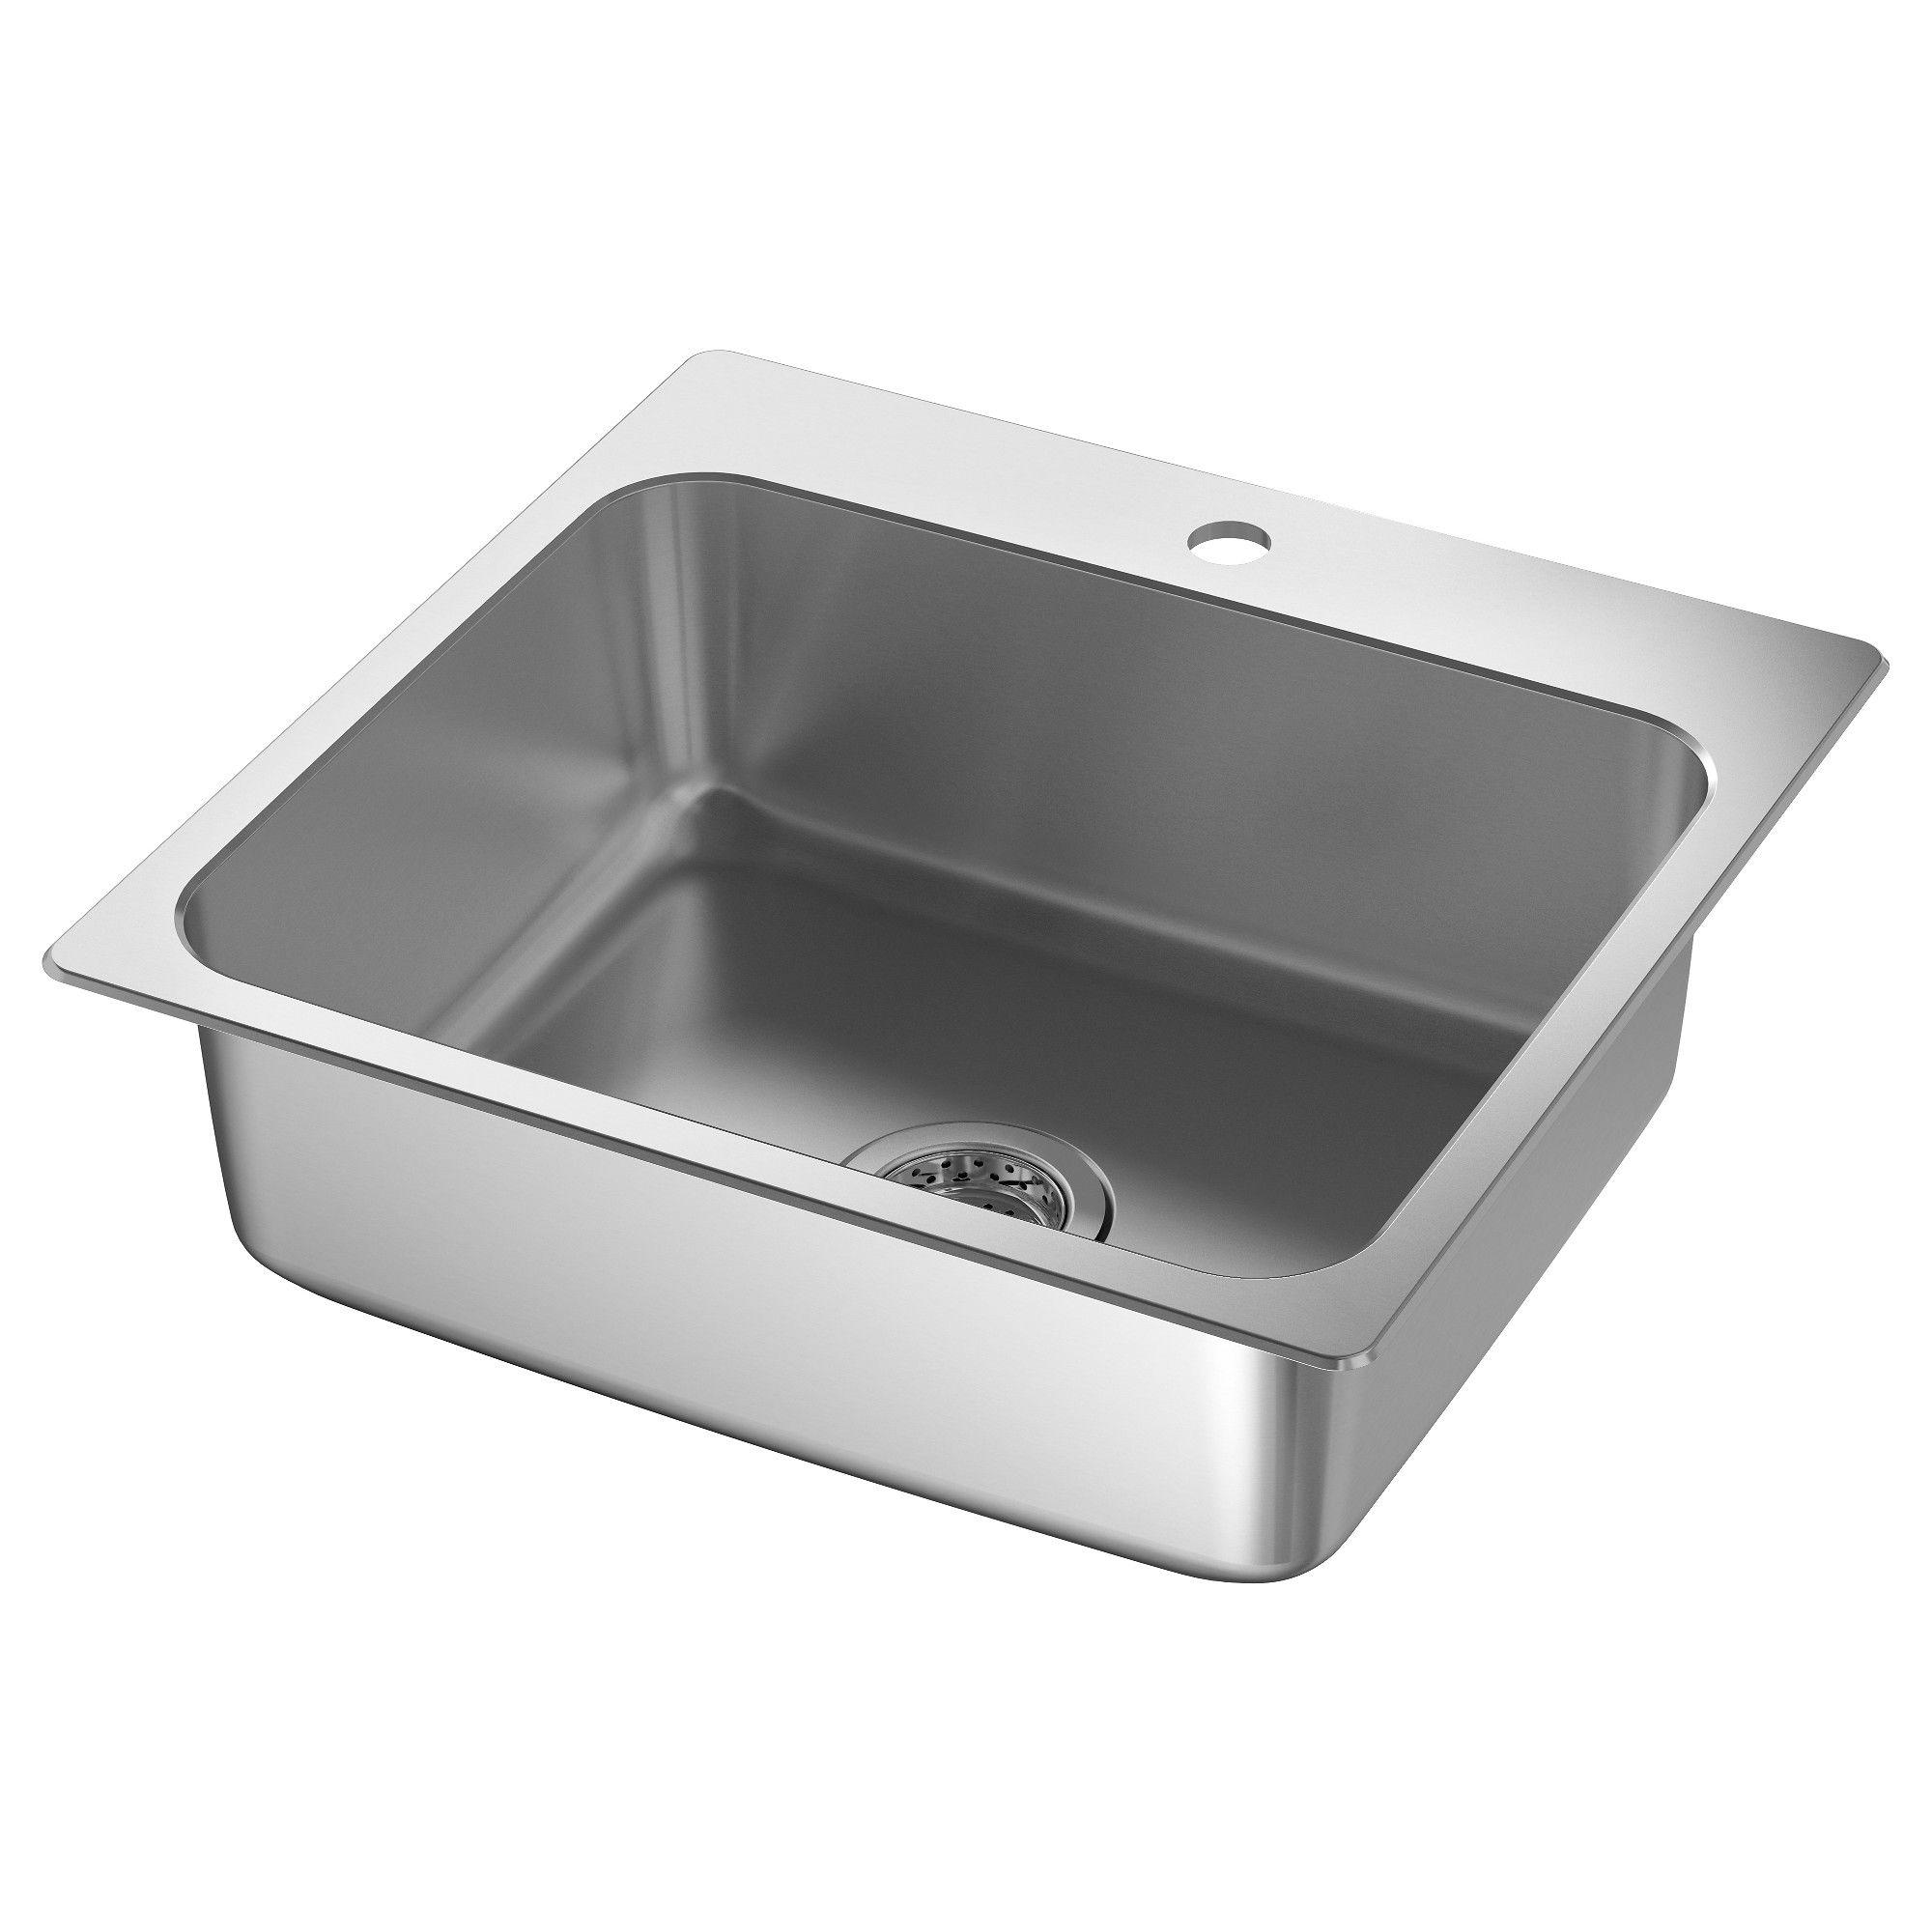 "LÅNGUDDEN Sink stainless steel 22x20 5/8 "" Inset sink"